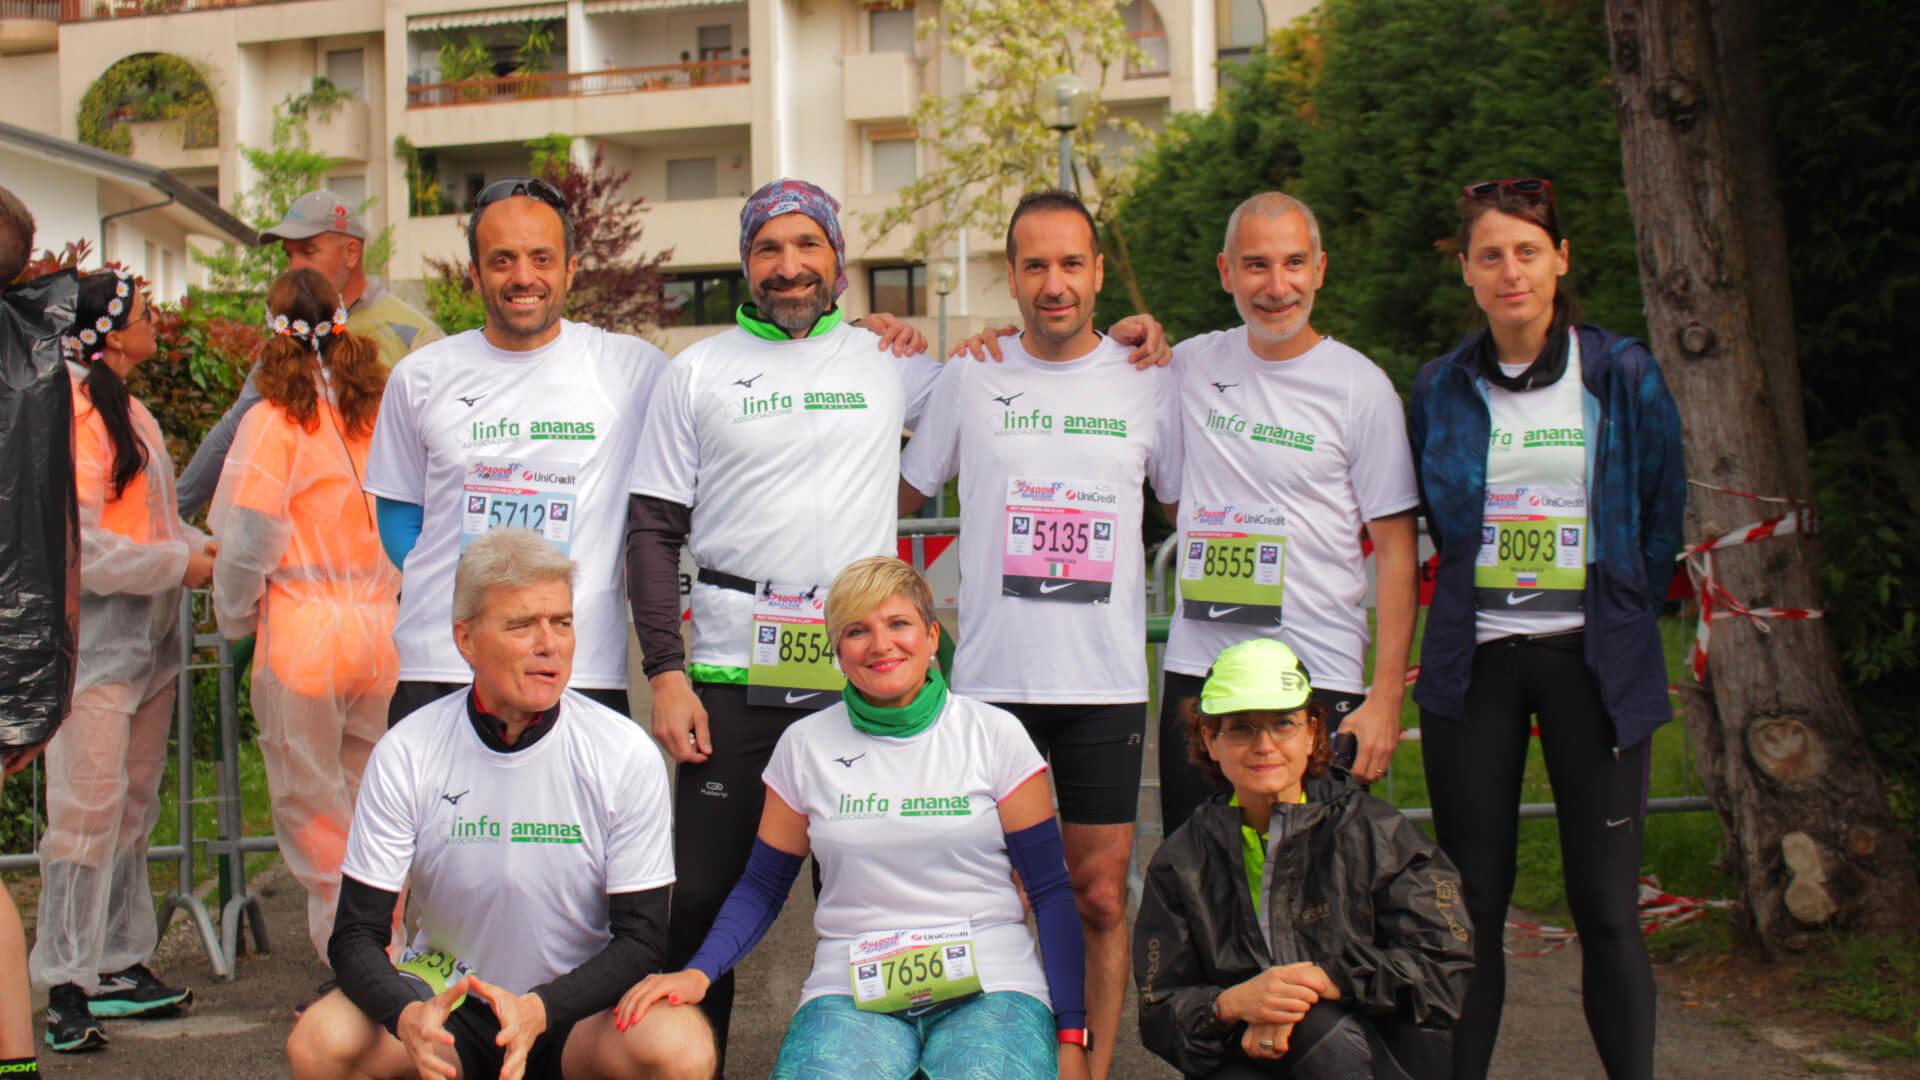 padova-maratona-linfa-2